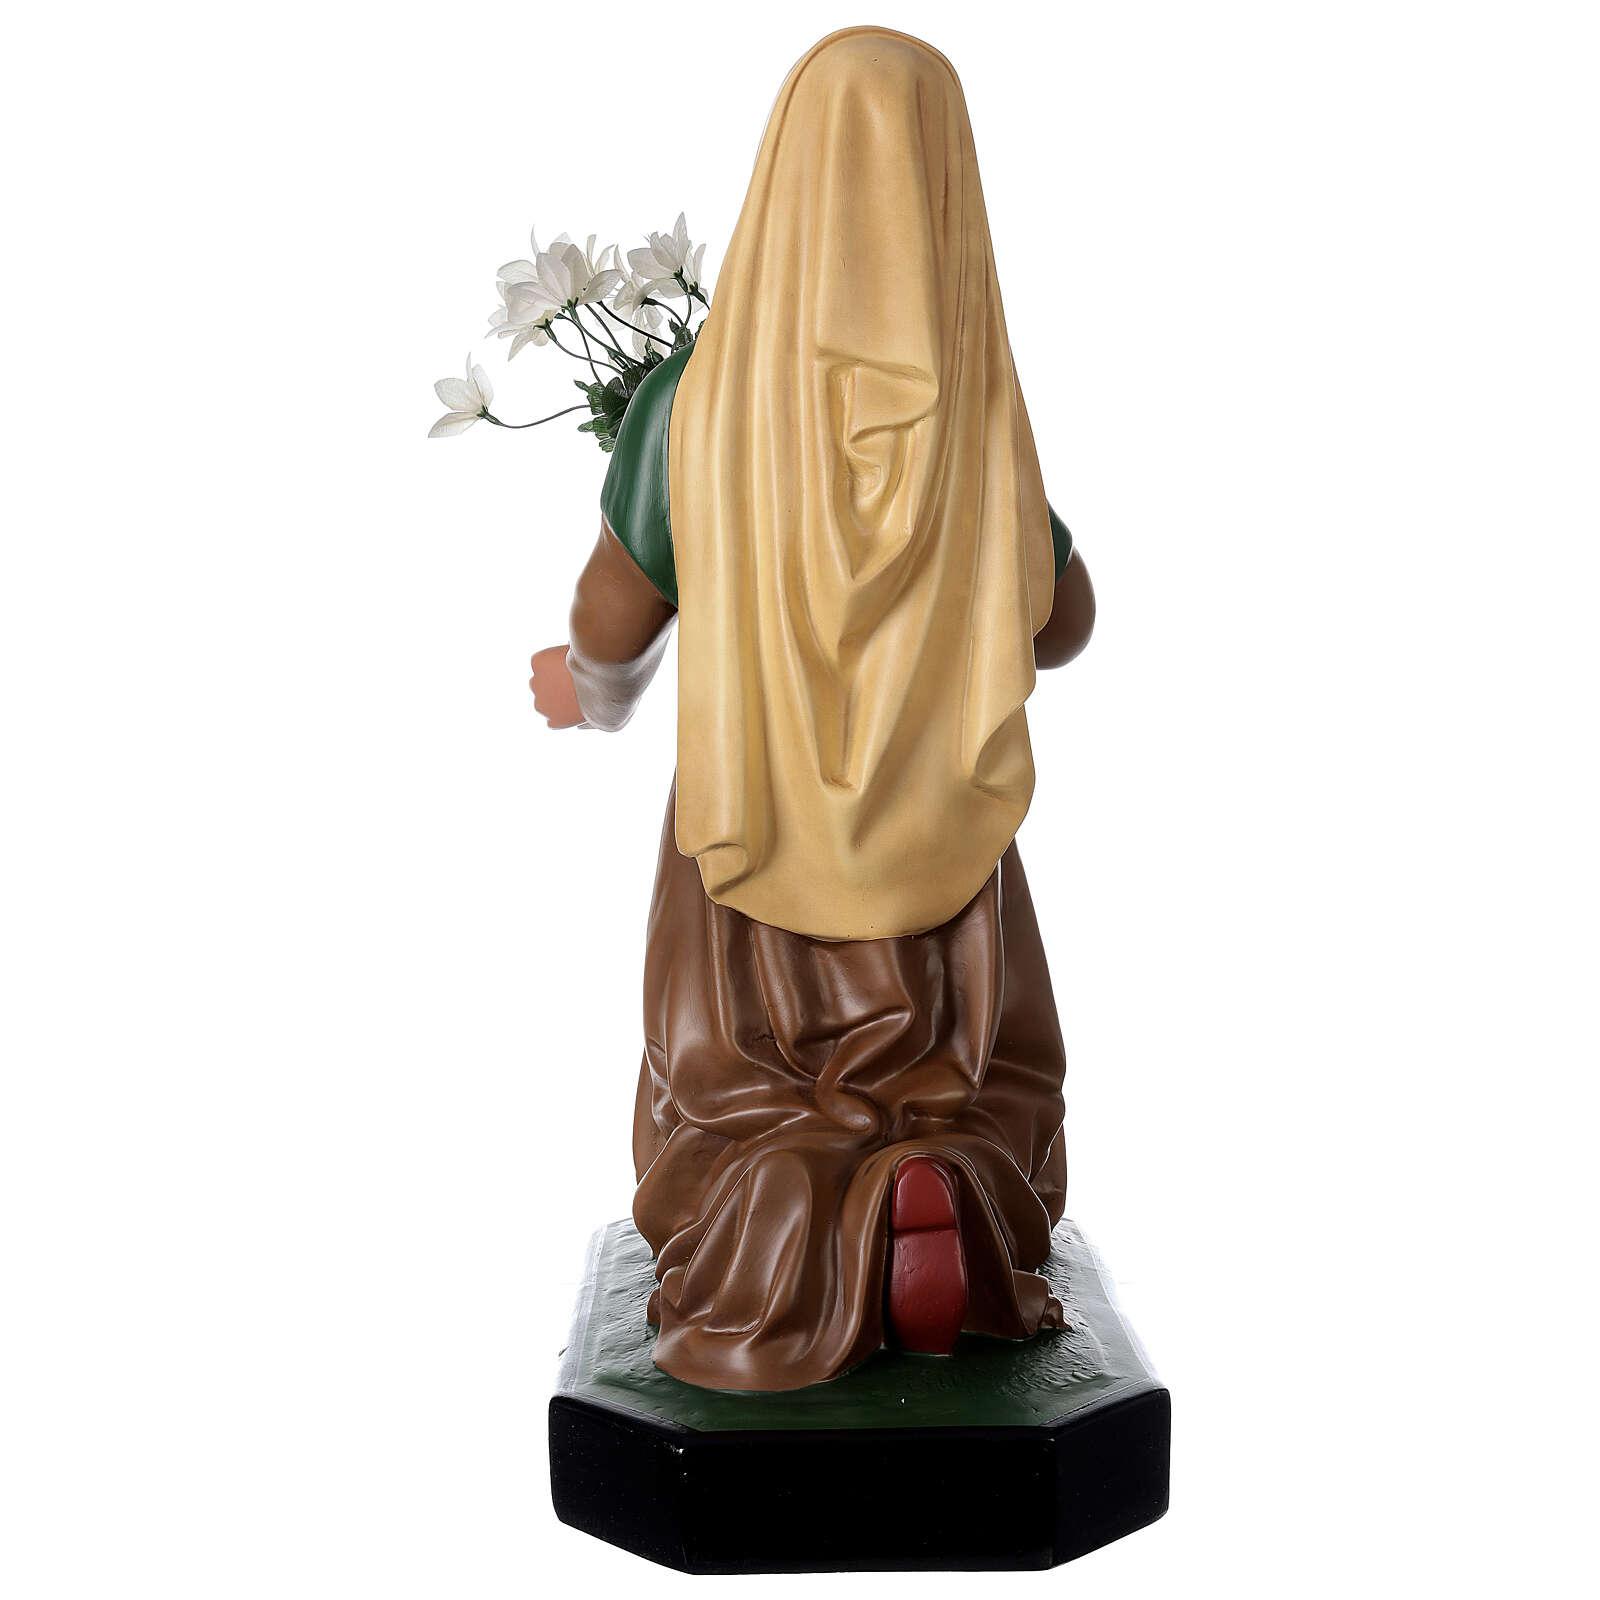 Resin statue of Saint Bernadette 32 in hand-painted Arte Barsanti 4